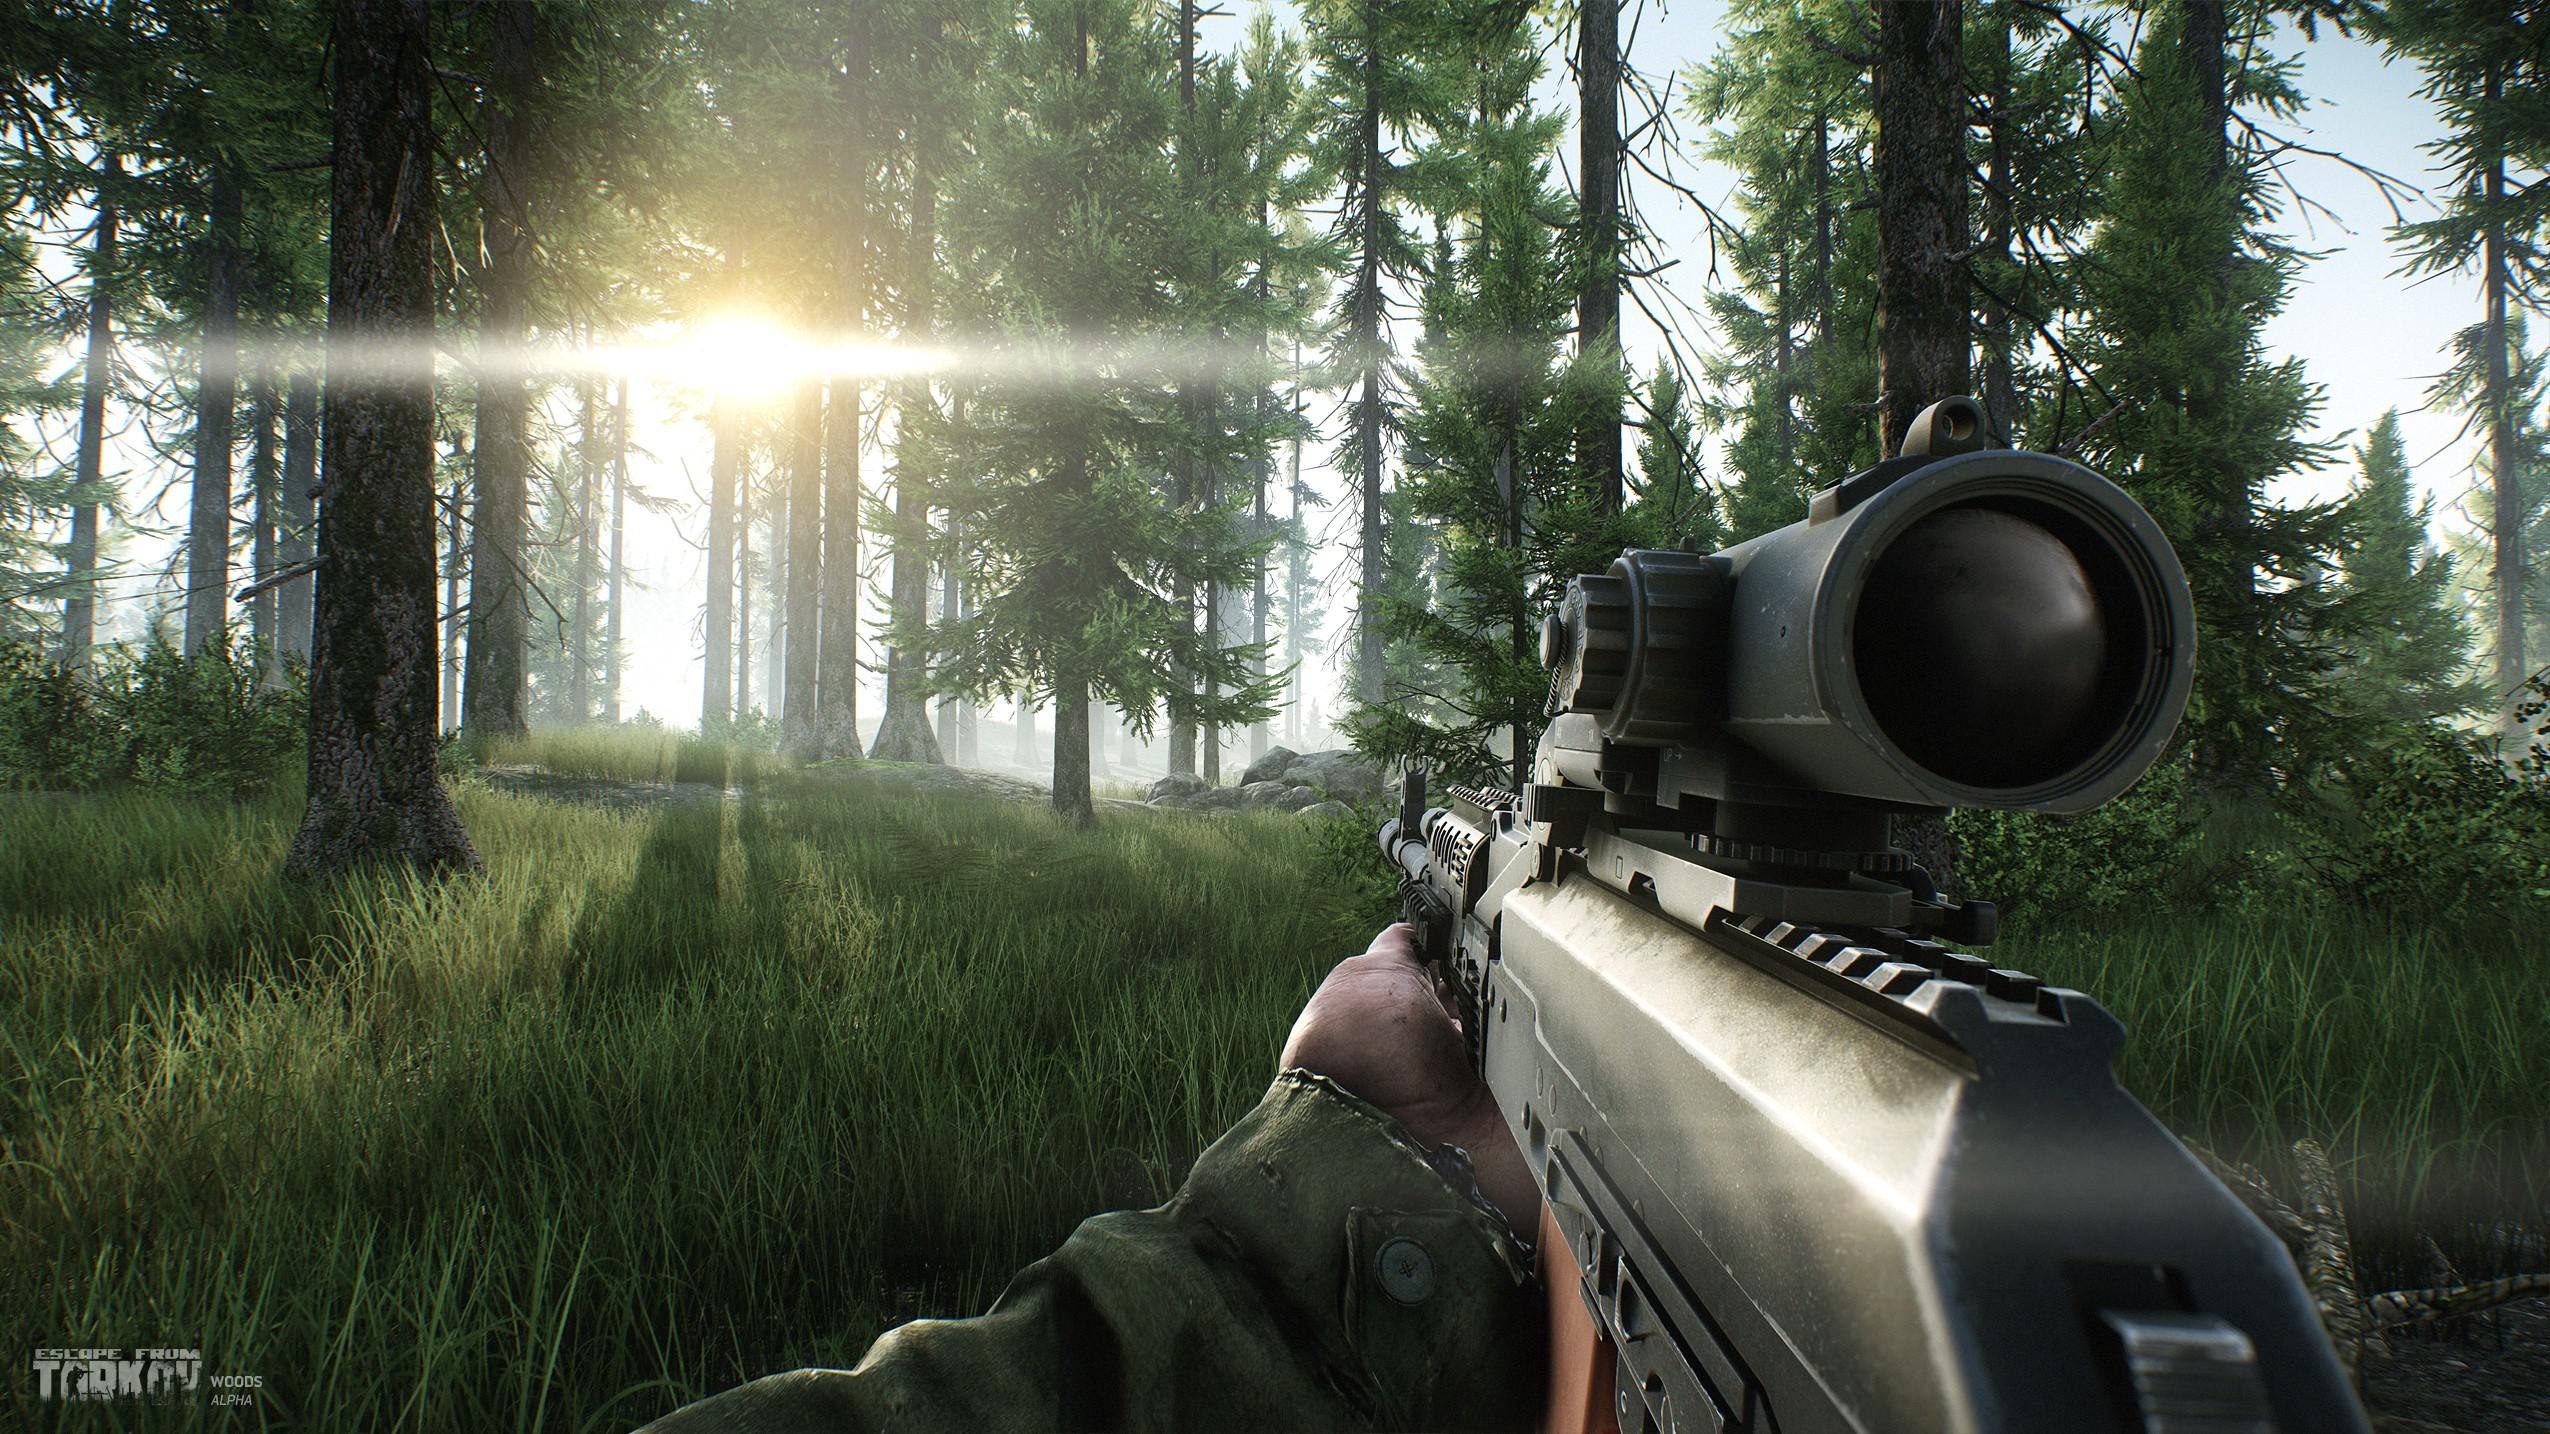 Wallpaper Video Games Soldier Escape From Tarkov War Game